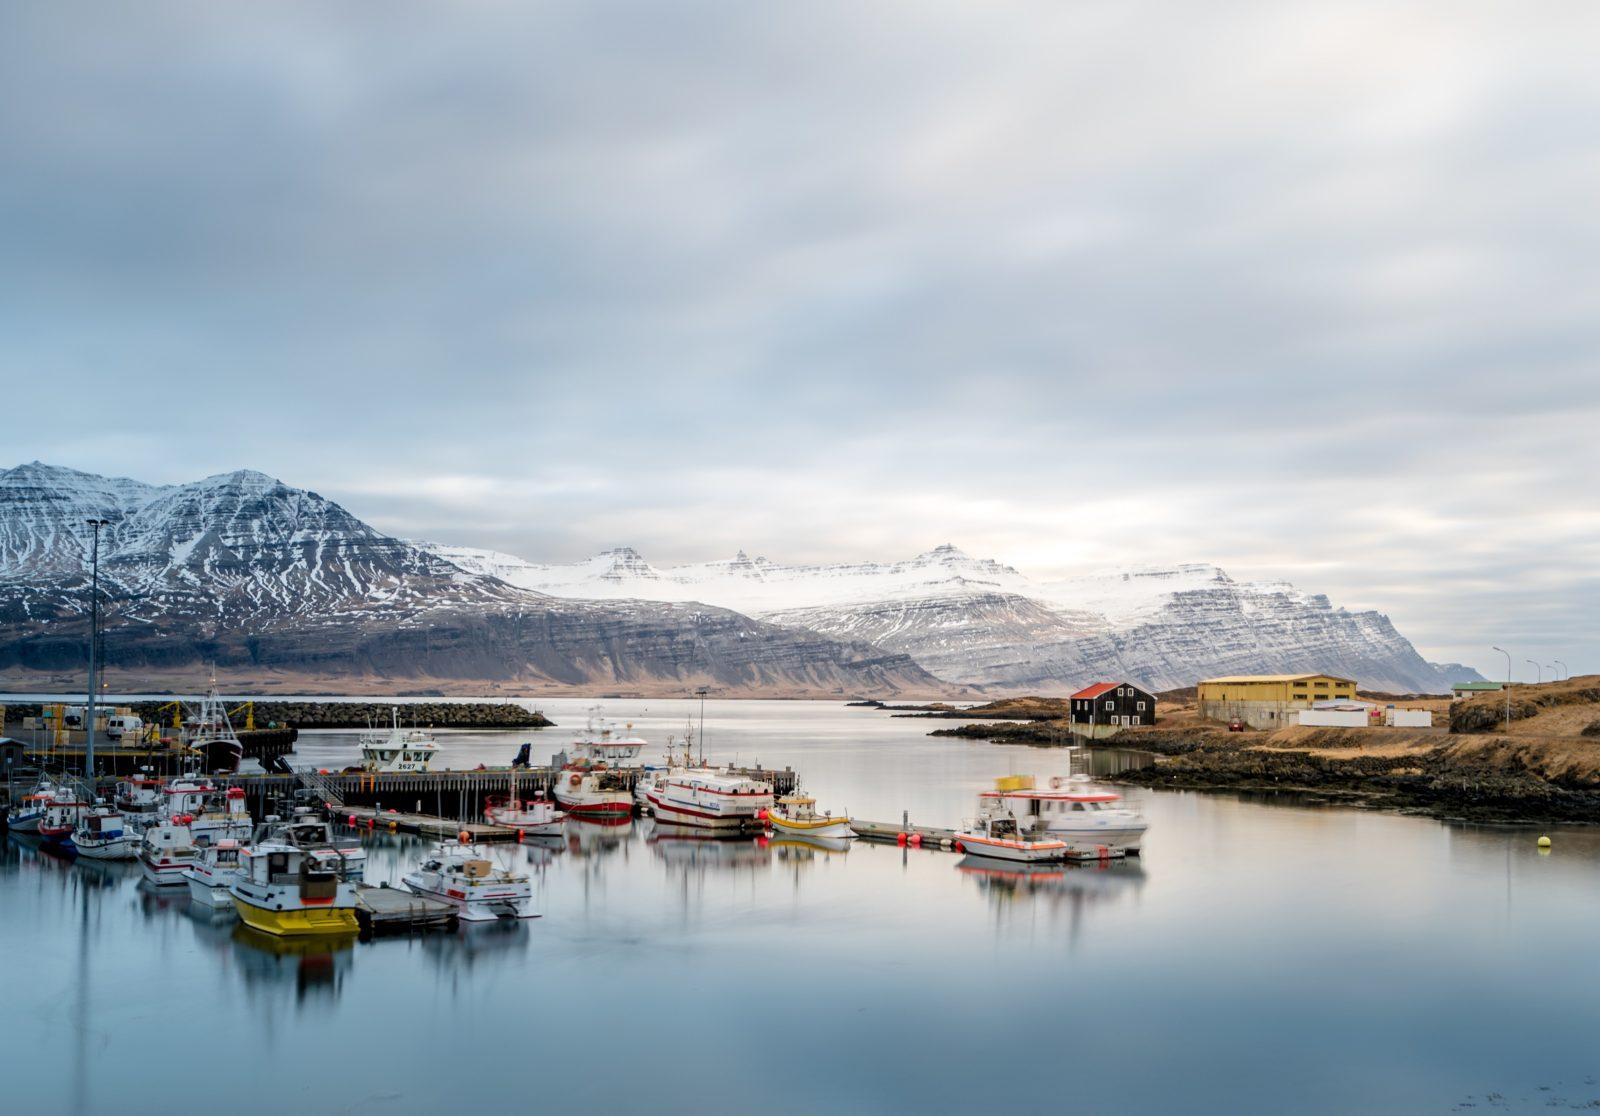 Seaport in Djúpivogur, Iceland